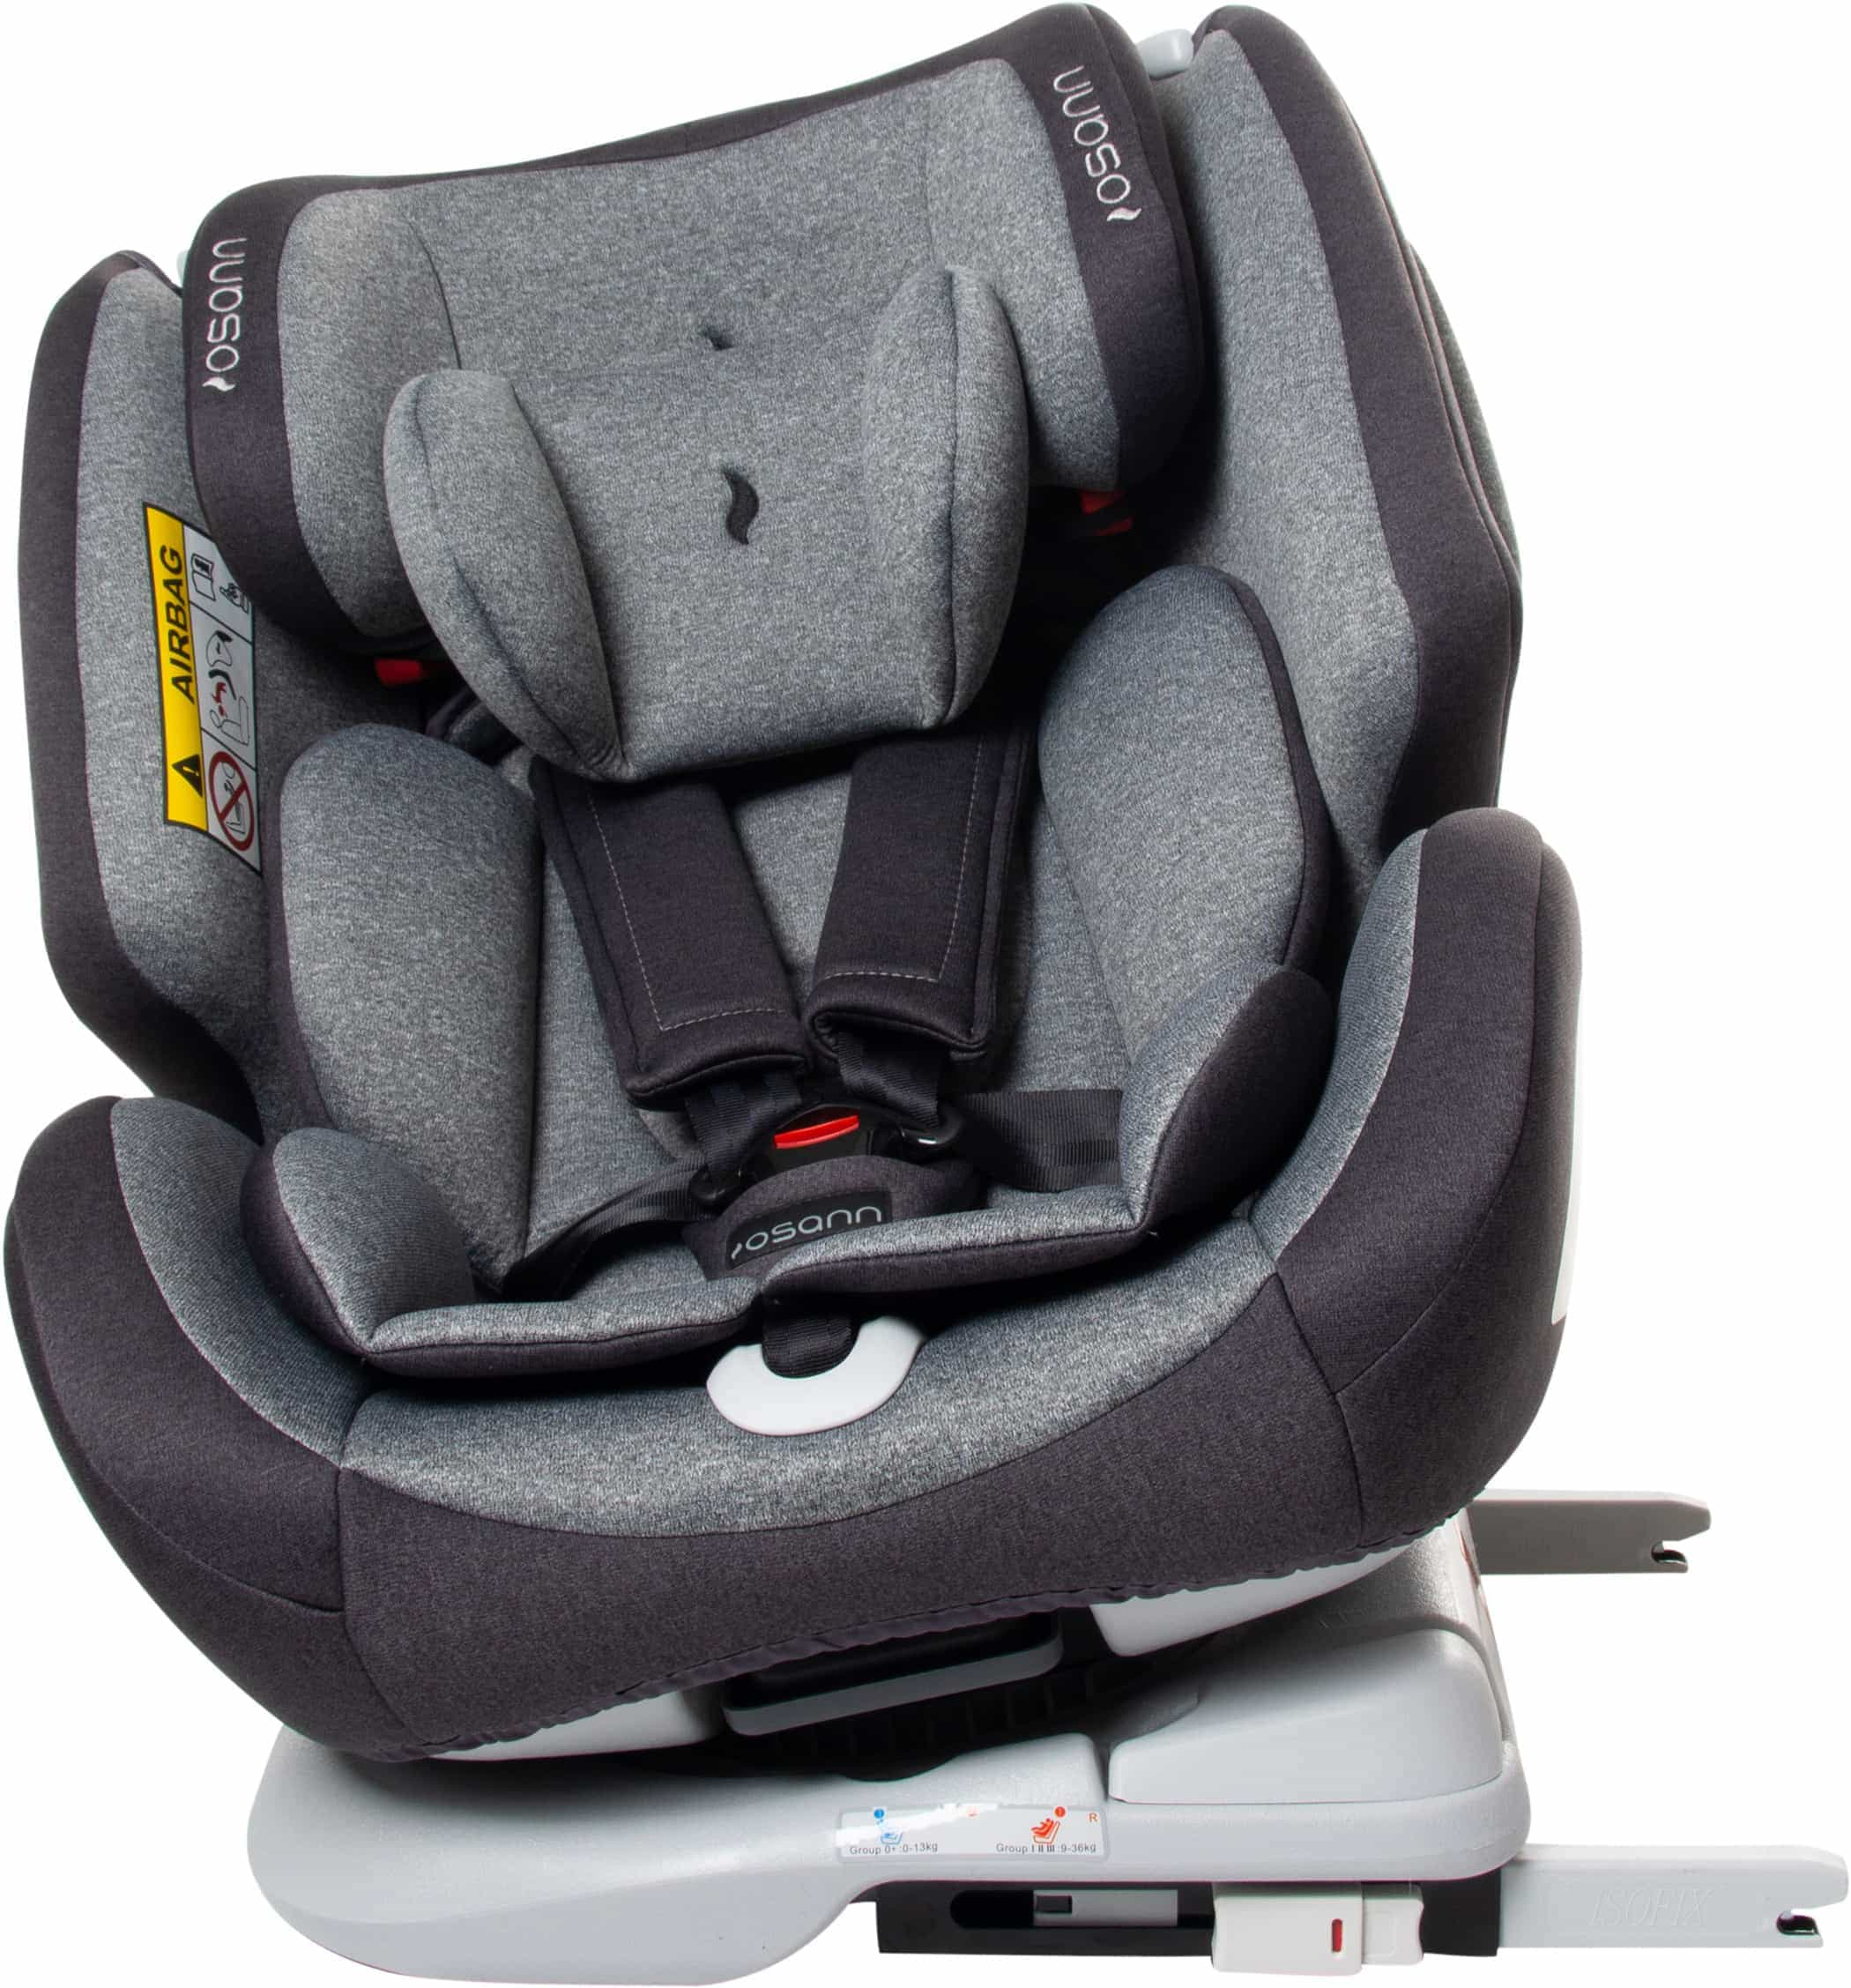 silla coche bebe one osann rotacion lateral